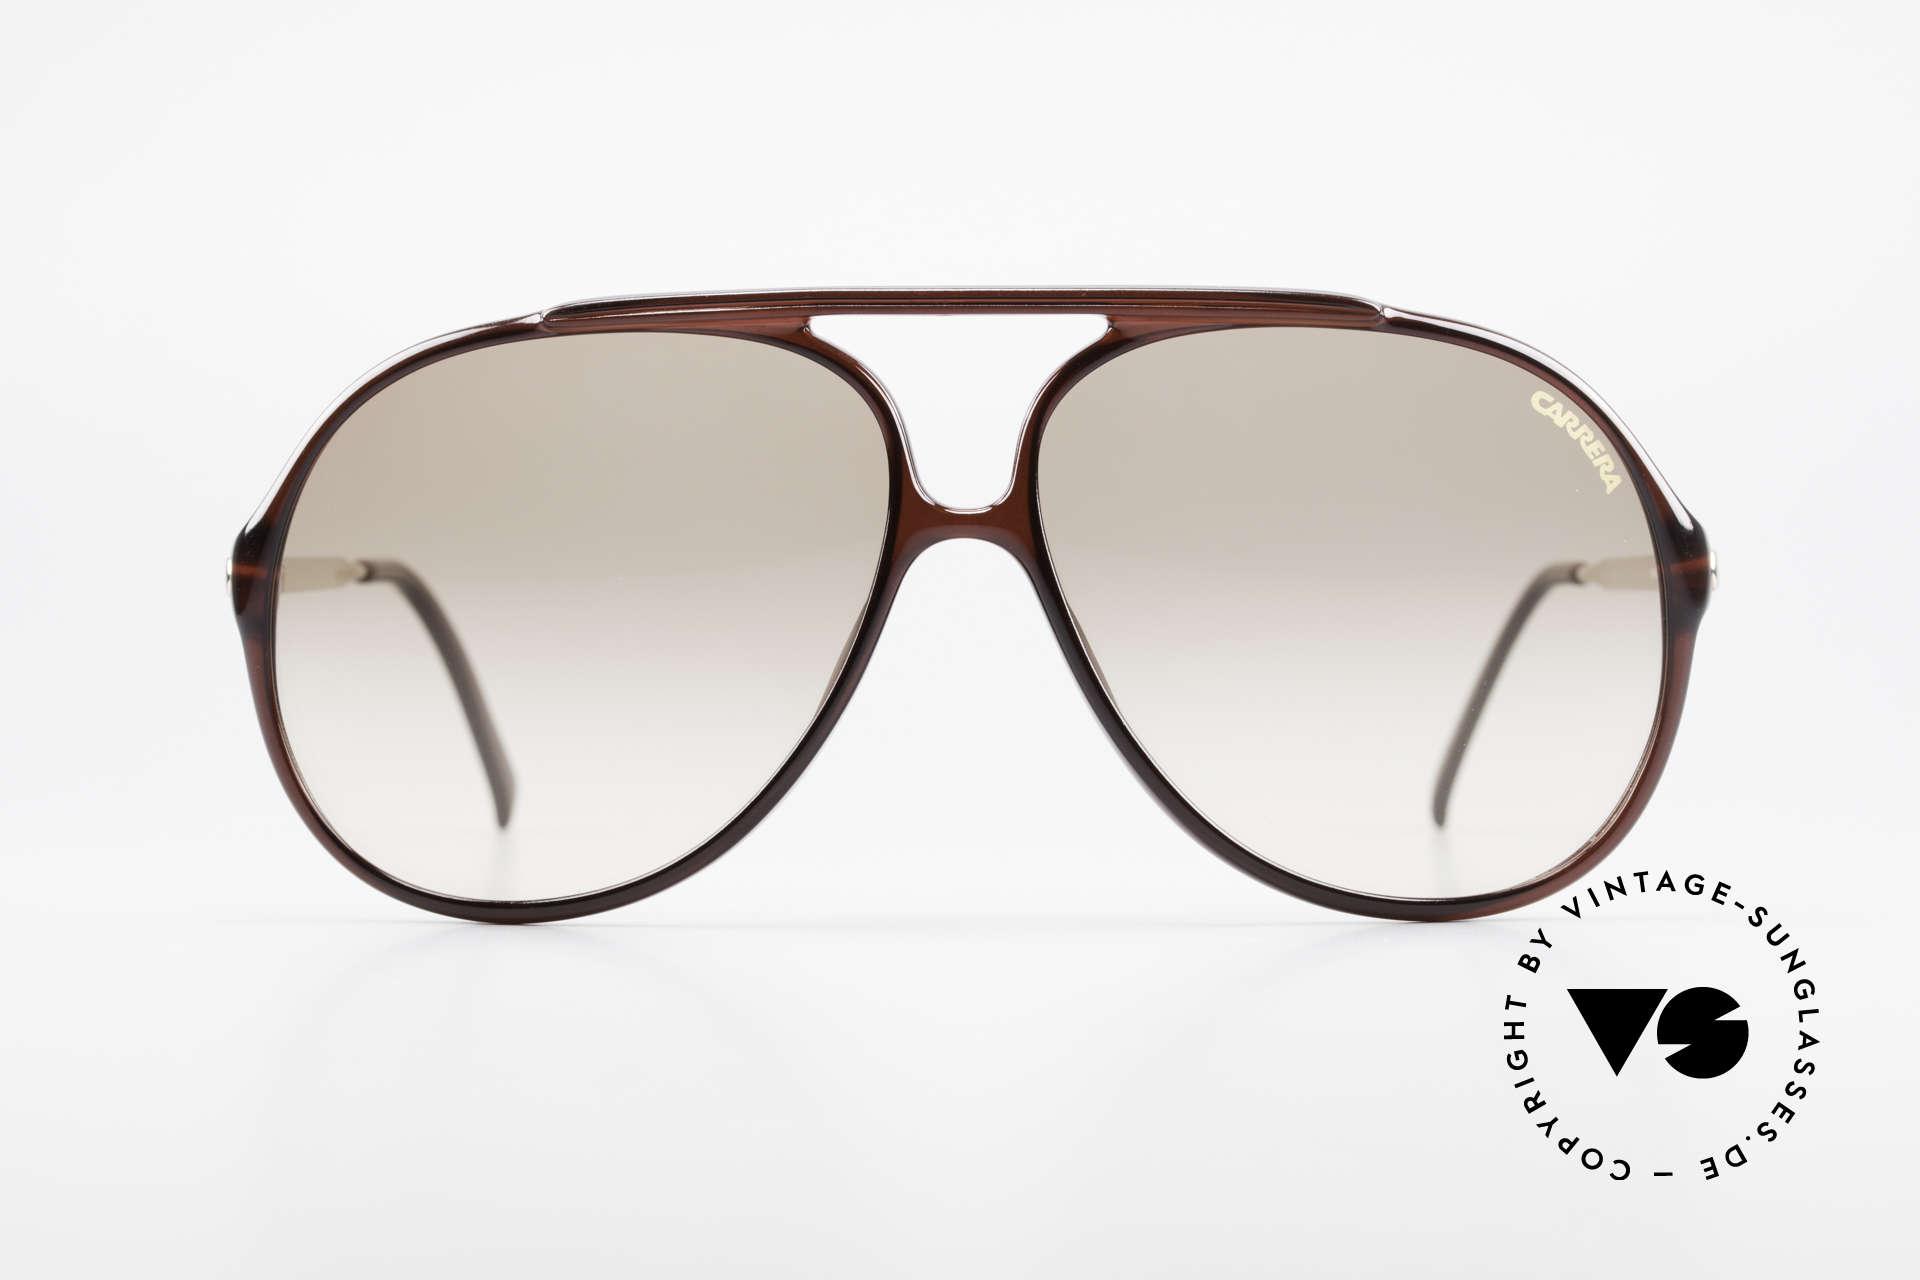 e580972a29ec7 Sunglasses Carrera 5587 Vintage 80 s XXL Sunglasses